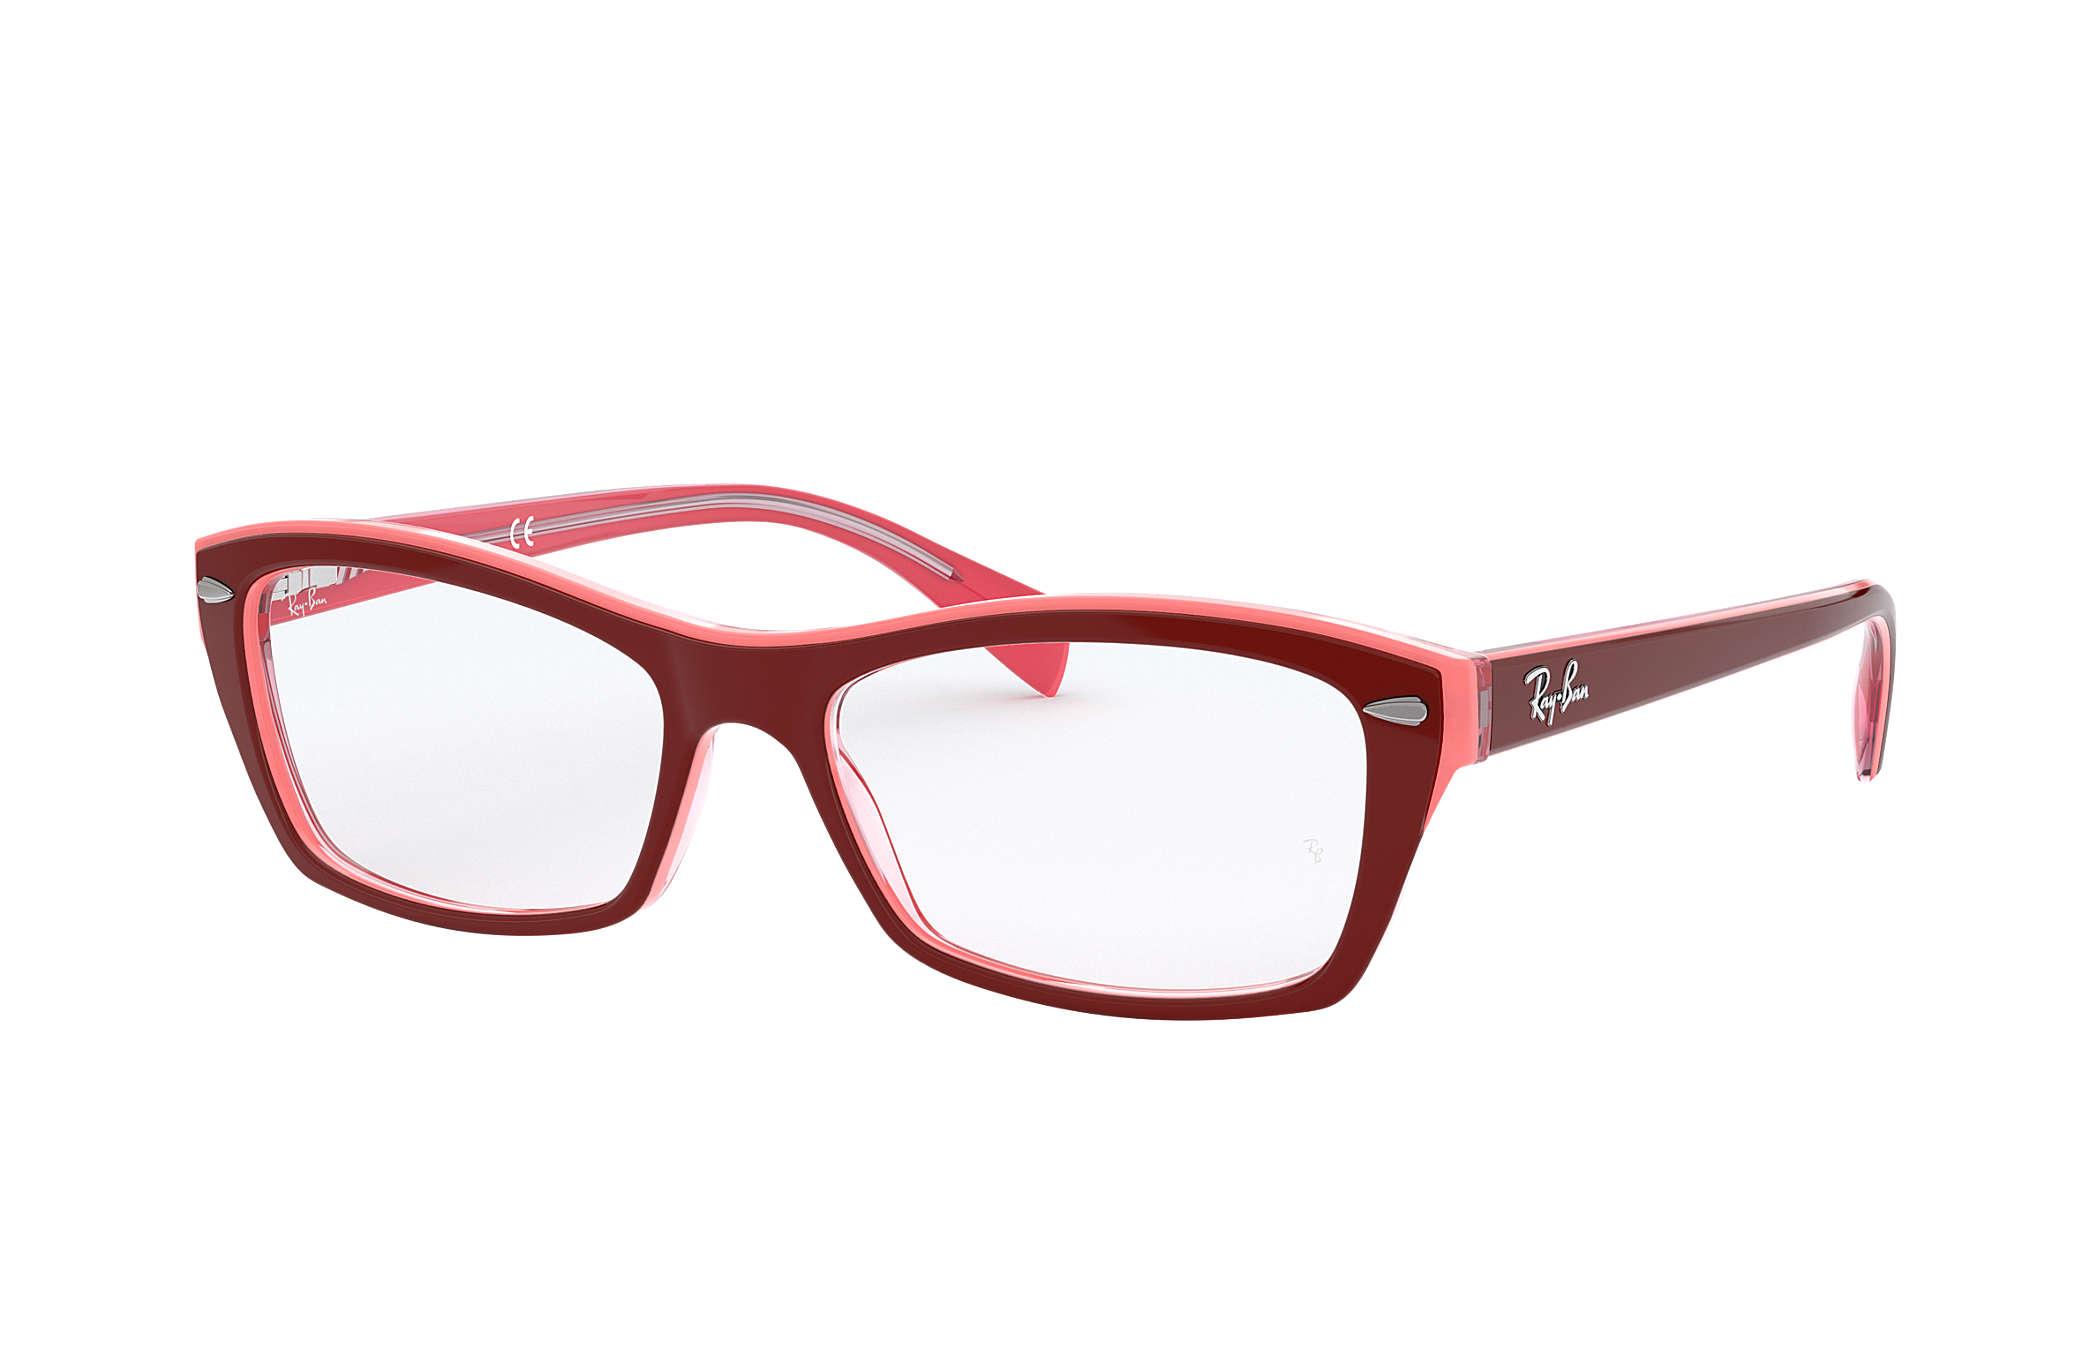 85a7f388b0e726 Okulary Ray-Ban RB5255 Czerwono-fioletowy - Acetat - 0RX5255577753 ...